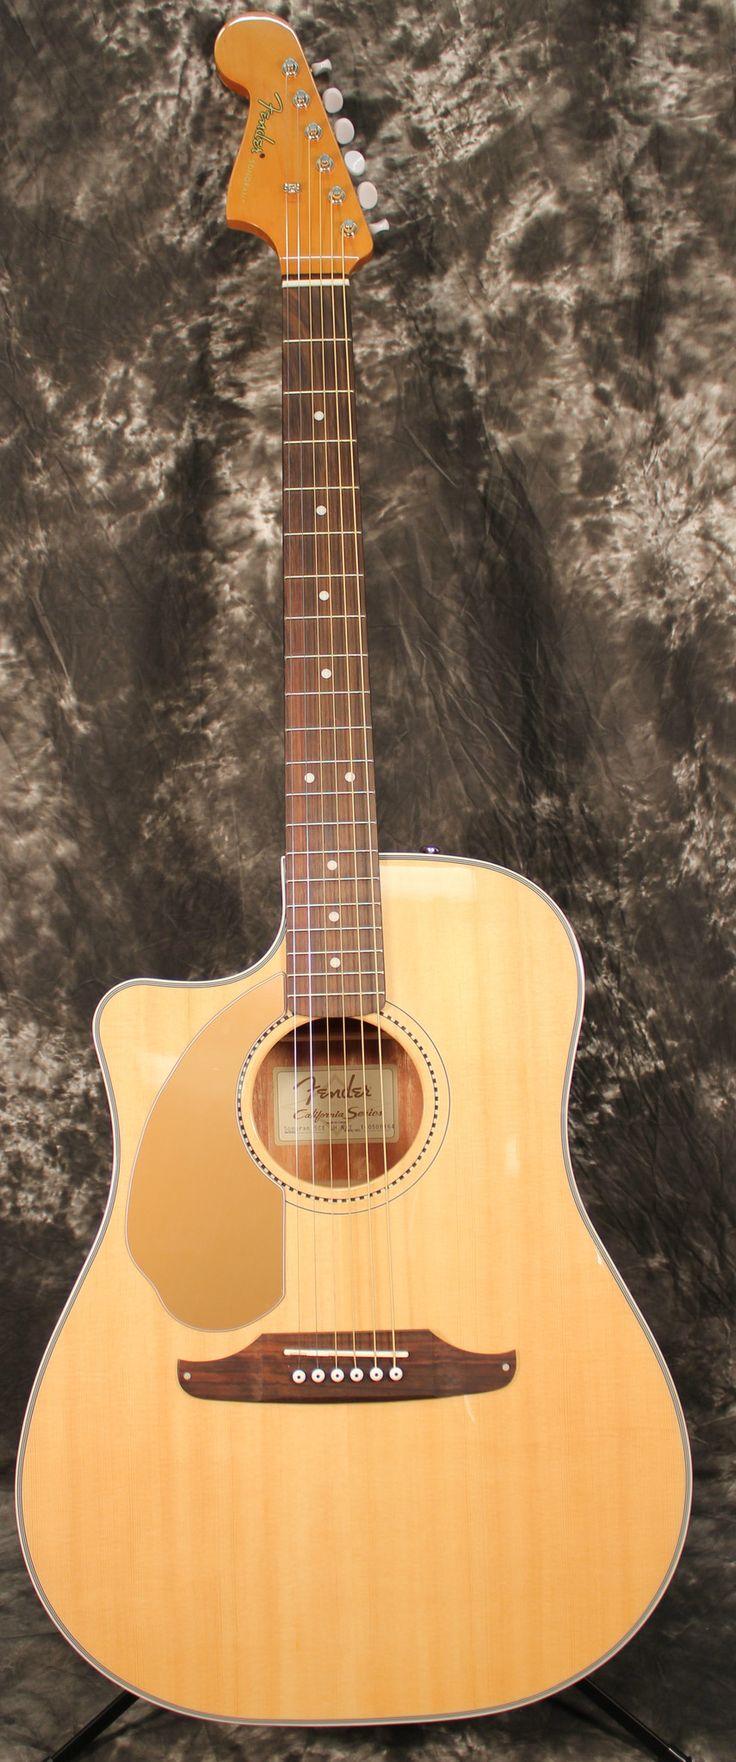 2015 Fender Sonoran SCE Left-Handed Acoustic Guitar Natural